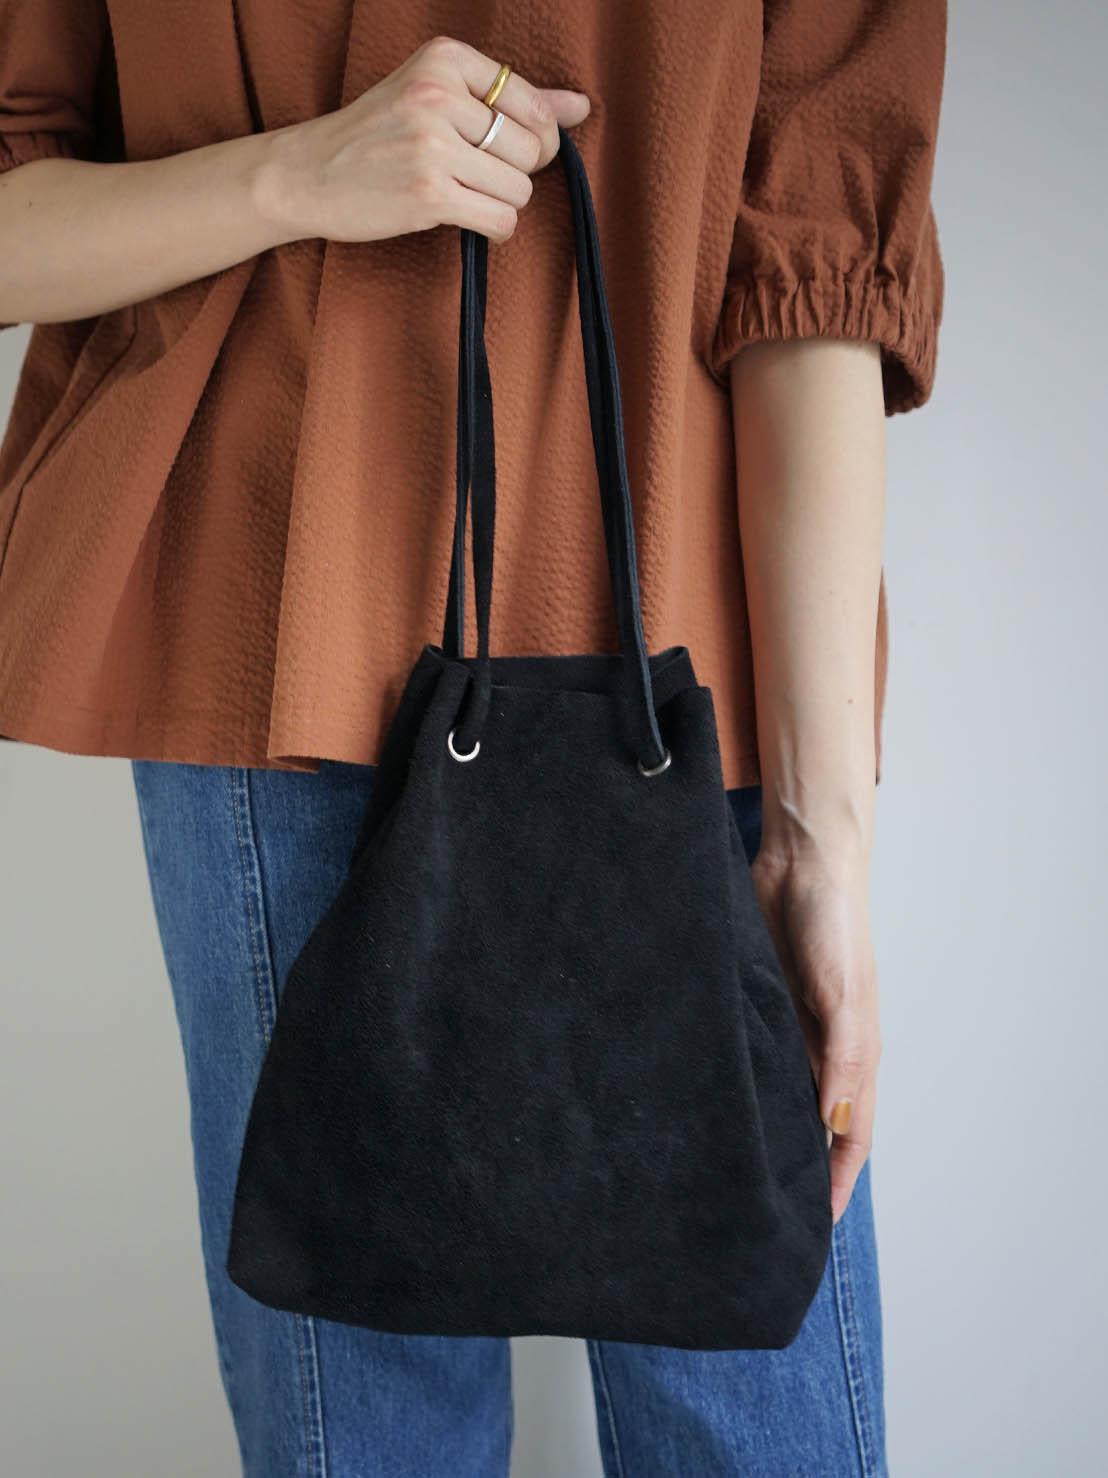 gesture / drawstring pouch